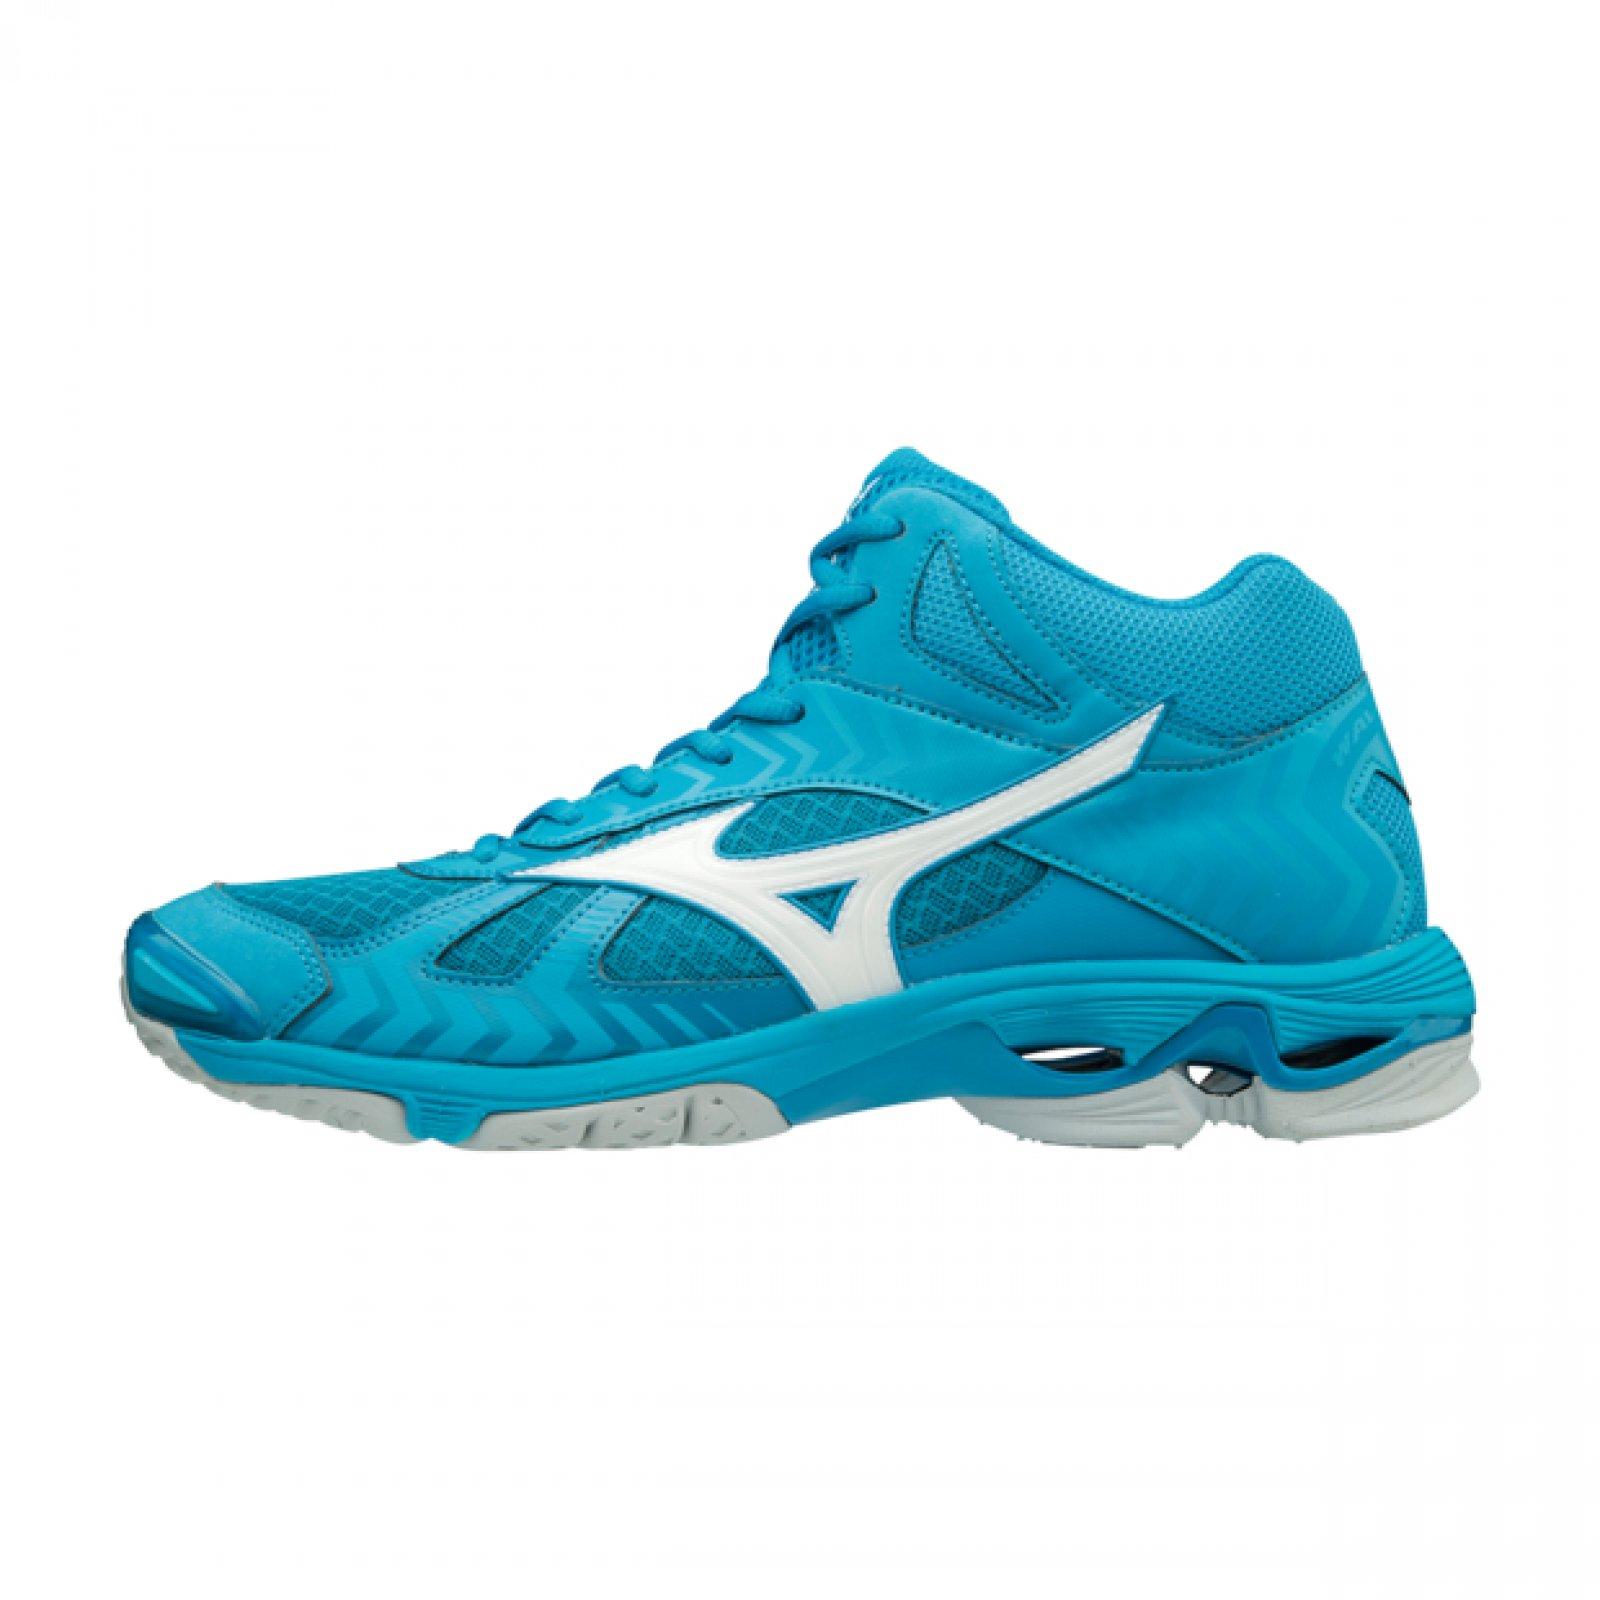 a1e466263bf Volejbalové boty Mizuno Wave Bolt 7 Mid M V1GA186598 - Actisport.cz